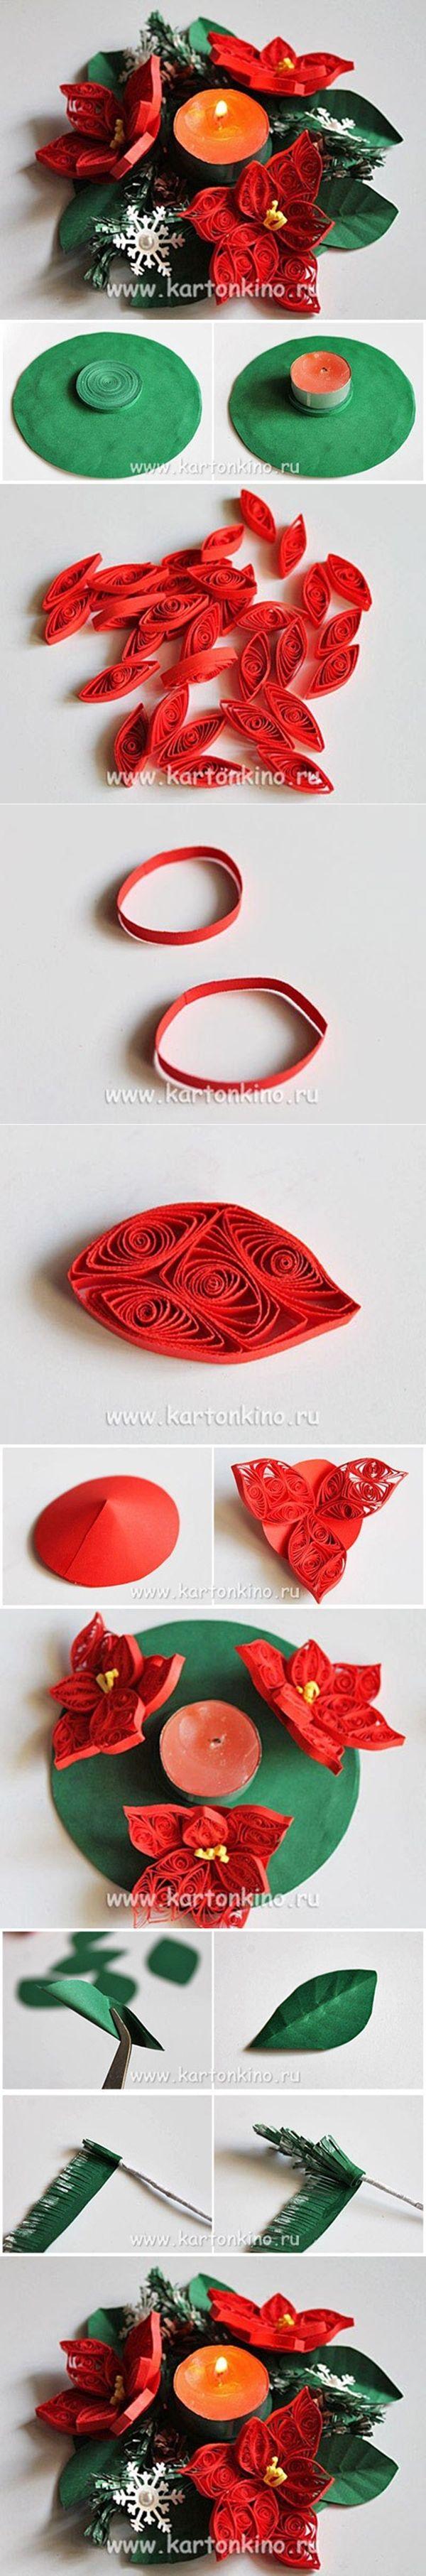 DIY 3D Quilling Flower Candle Holder | www.FabArtDIY.com LIKE Us on Facebook ==> https://www.facebook.com/FabArtDIY